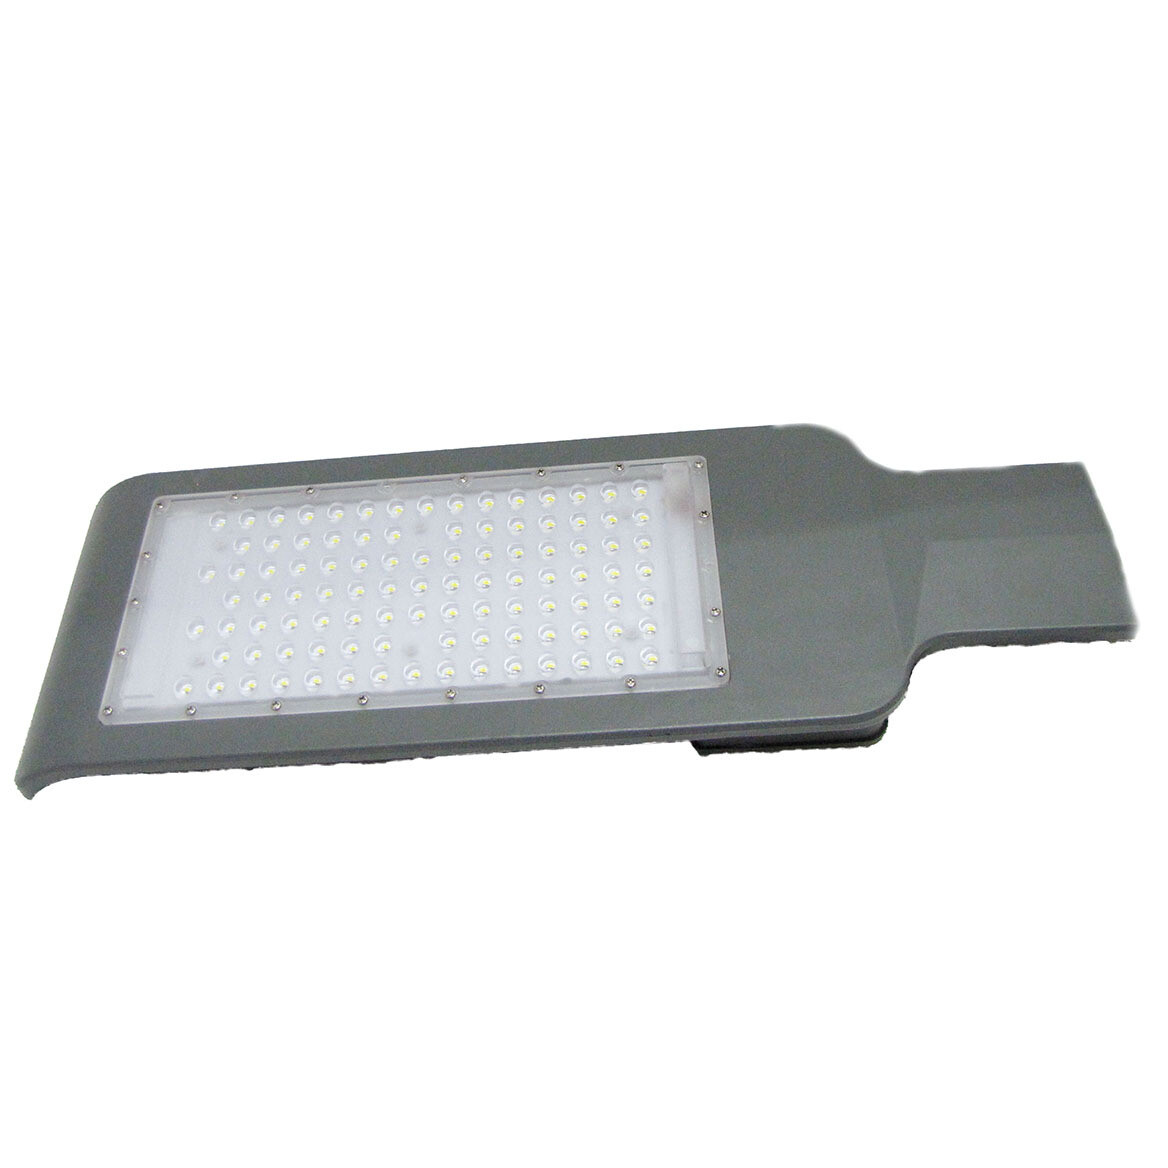 Light concepts LED SMD street light